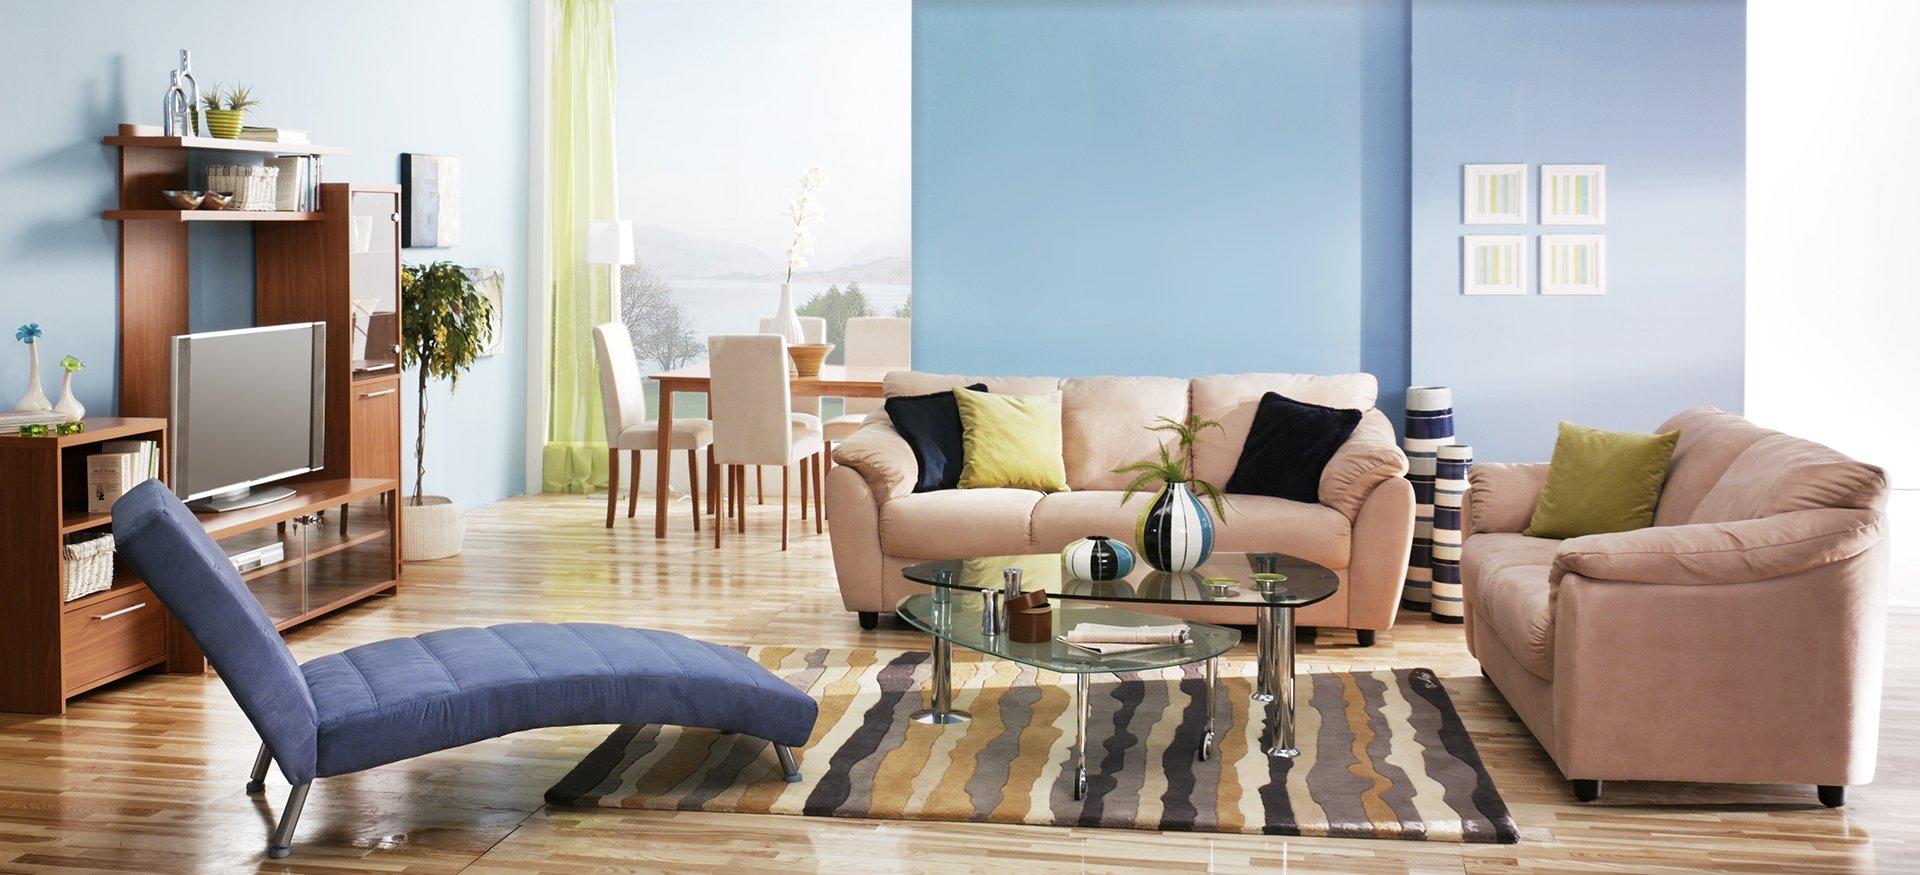 sift furnishing